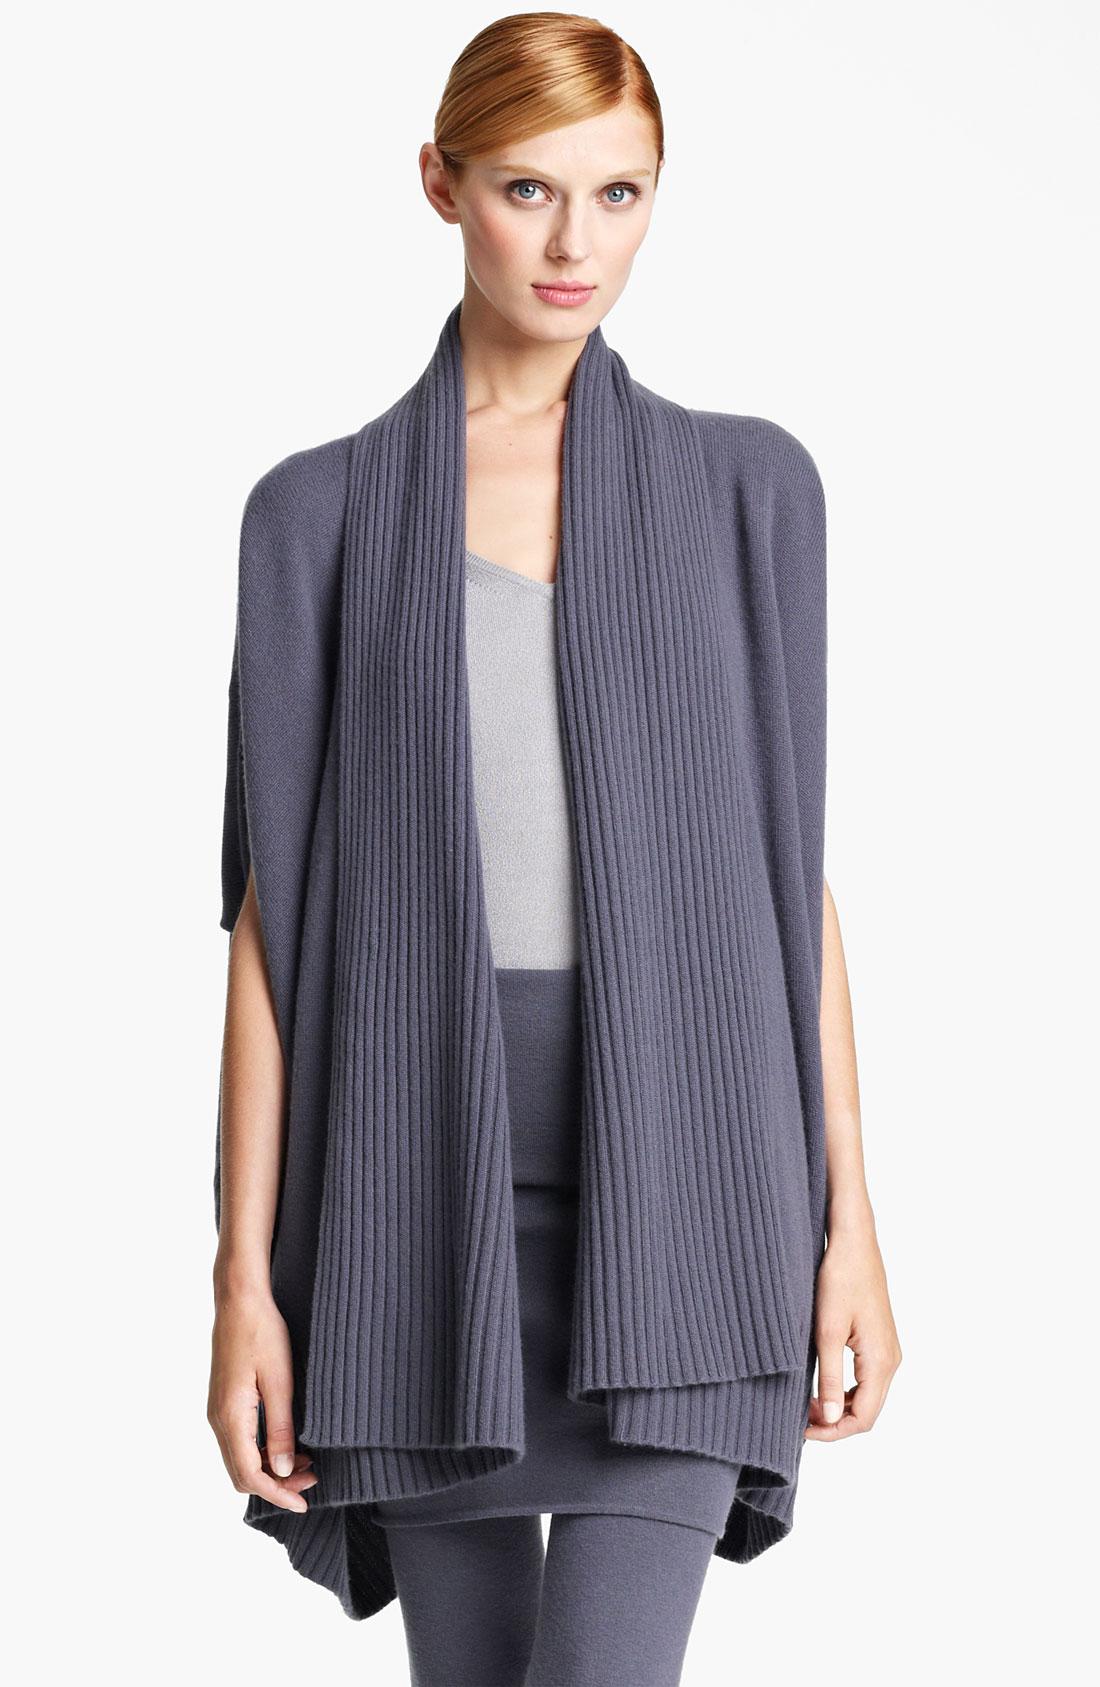 donna karan new york collection draped cashmere cardigan. Black Bedroom Furniture Sets. Home Design Ideas